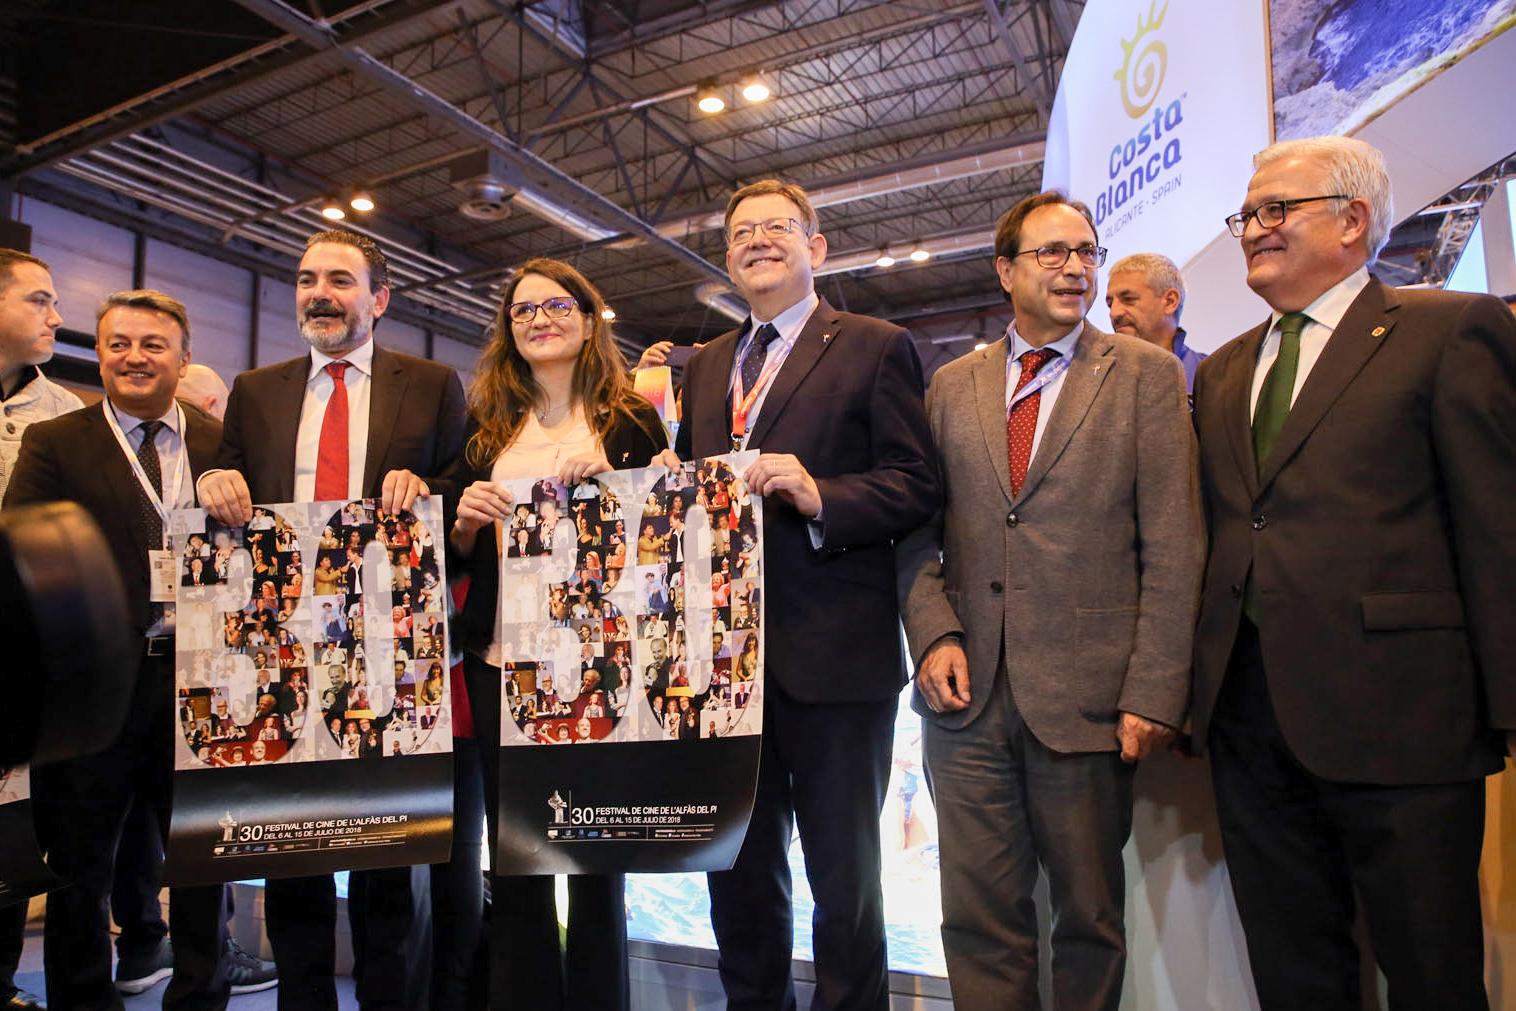 El President, Ximo Puig, junto a la Vicepresidenta del Consell, Mónica Oltra, en Fitur.